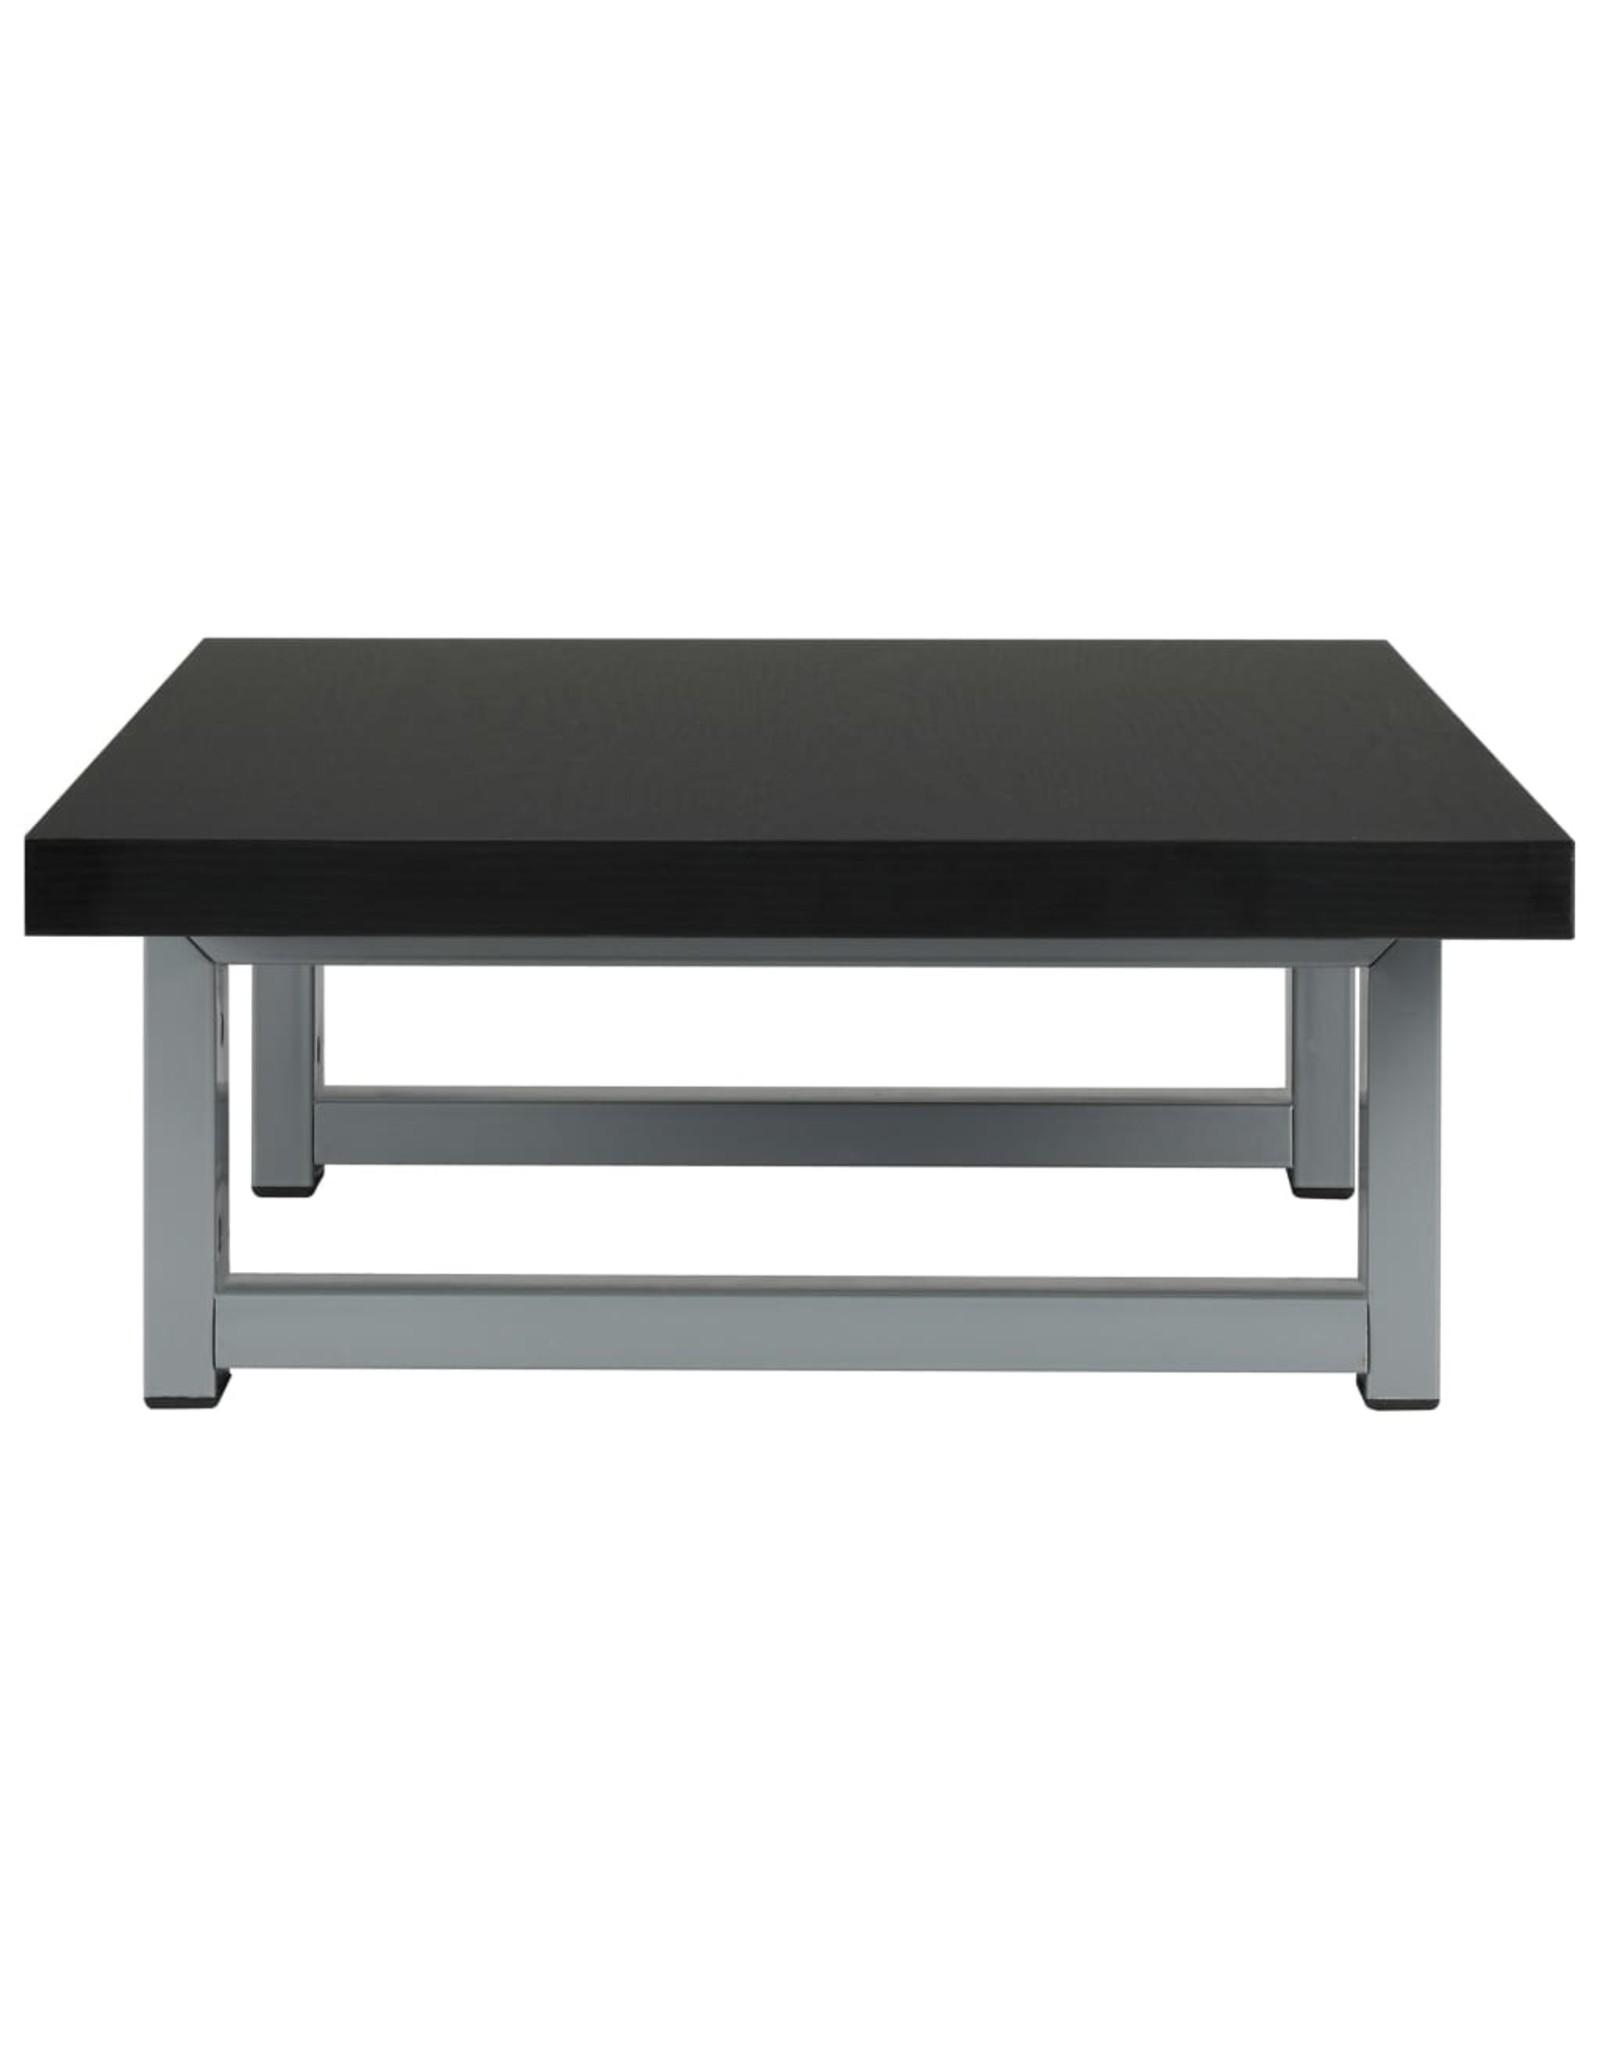 Badkamermeubel 60x40x16,3 cm zwart